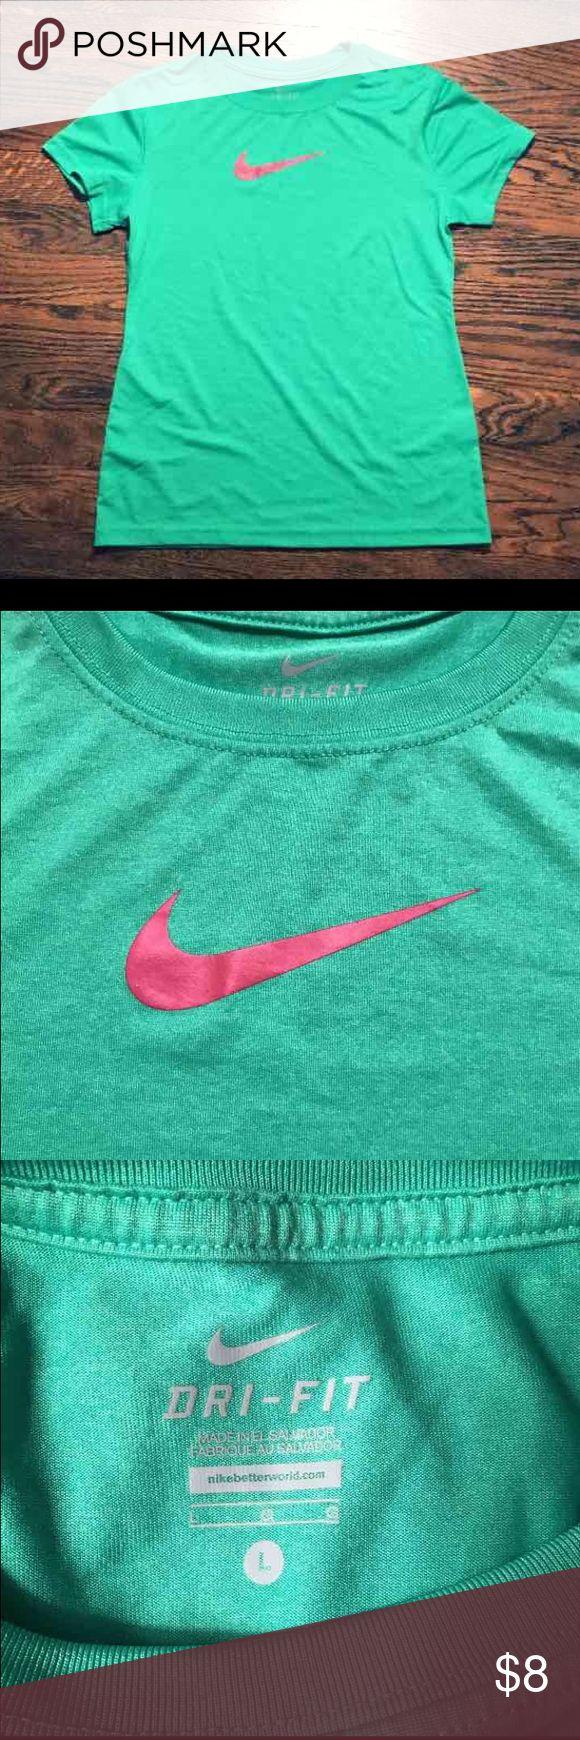 SOLD Green Tshirt w/Hot Pink Nike Swoosh Logo Pink